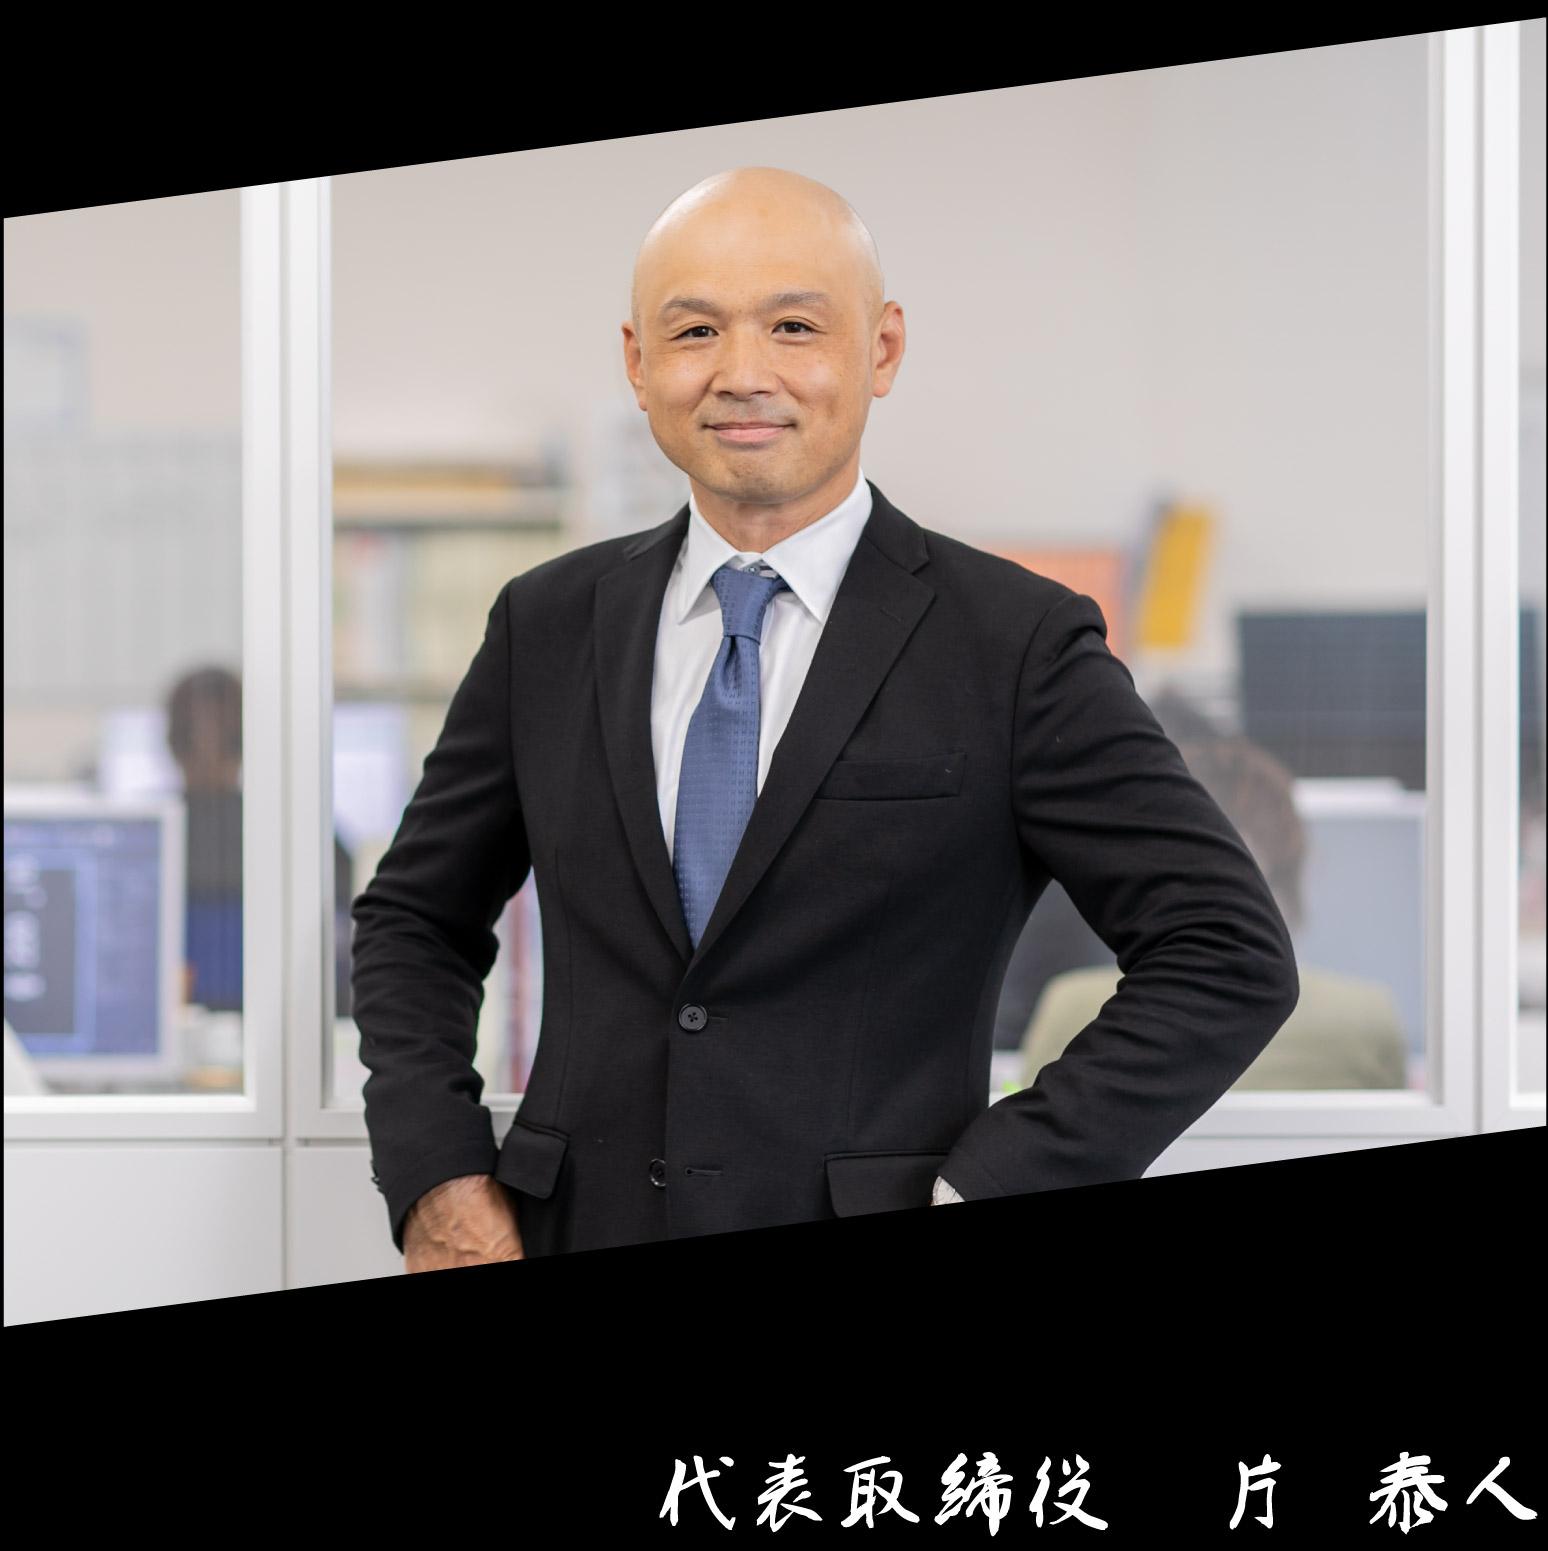 株式会社スカイブルー 代表取締役 片 泰人